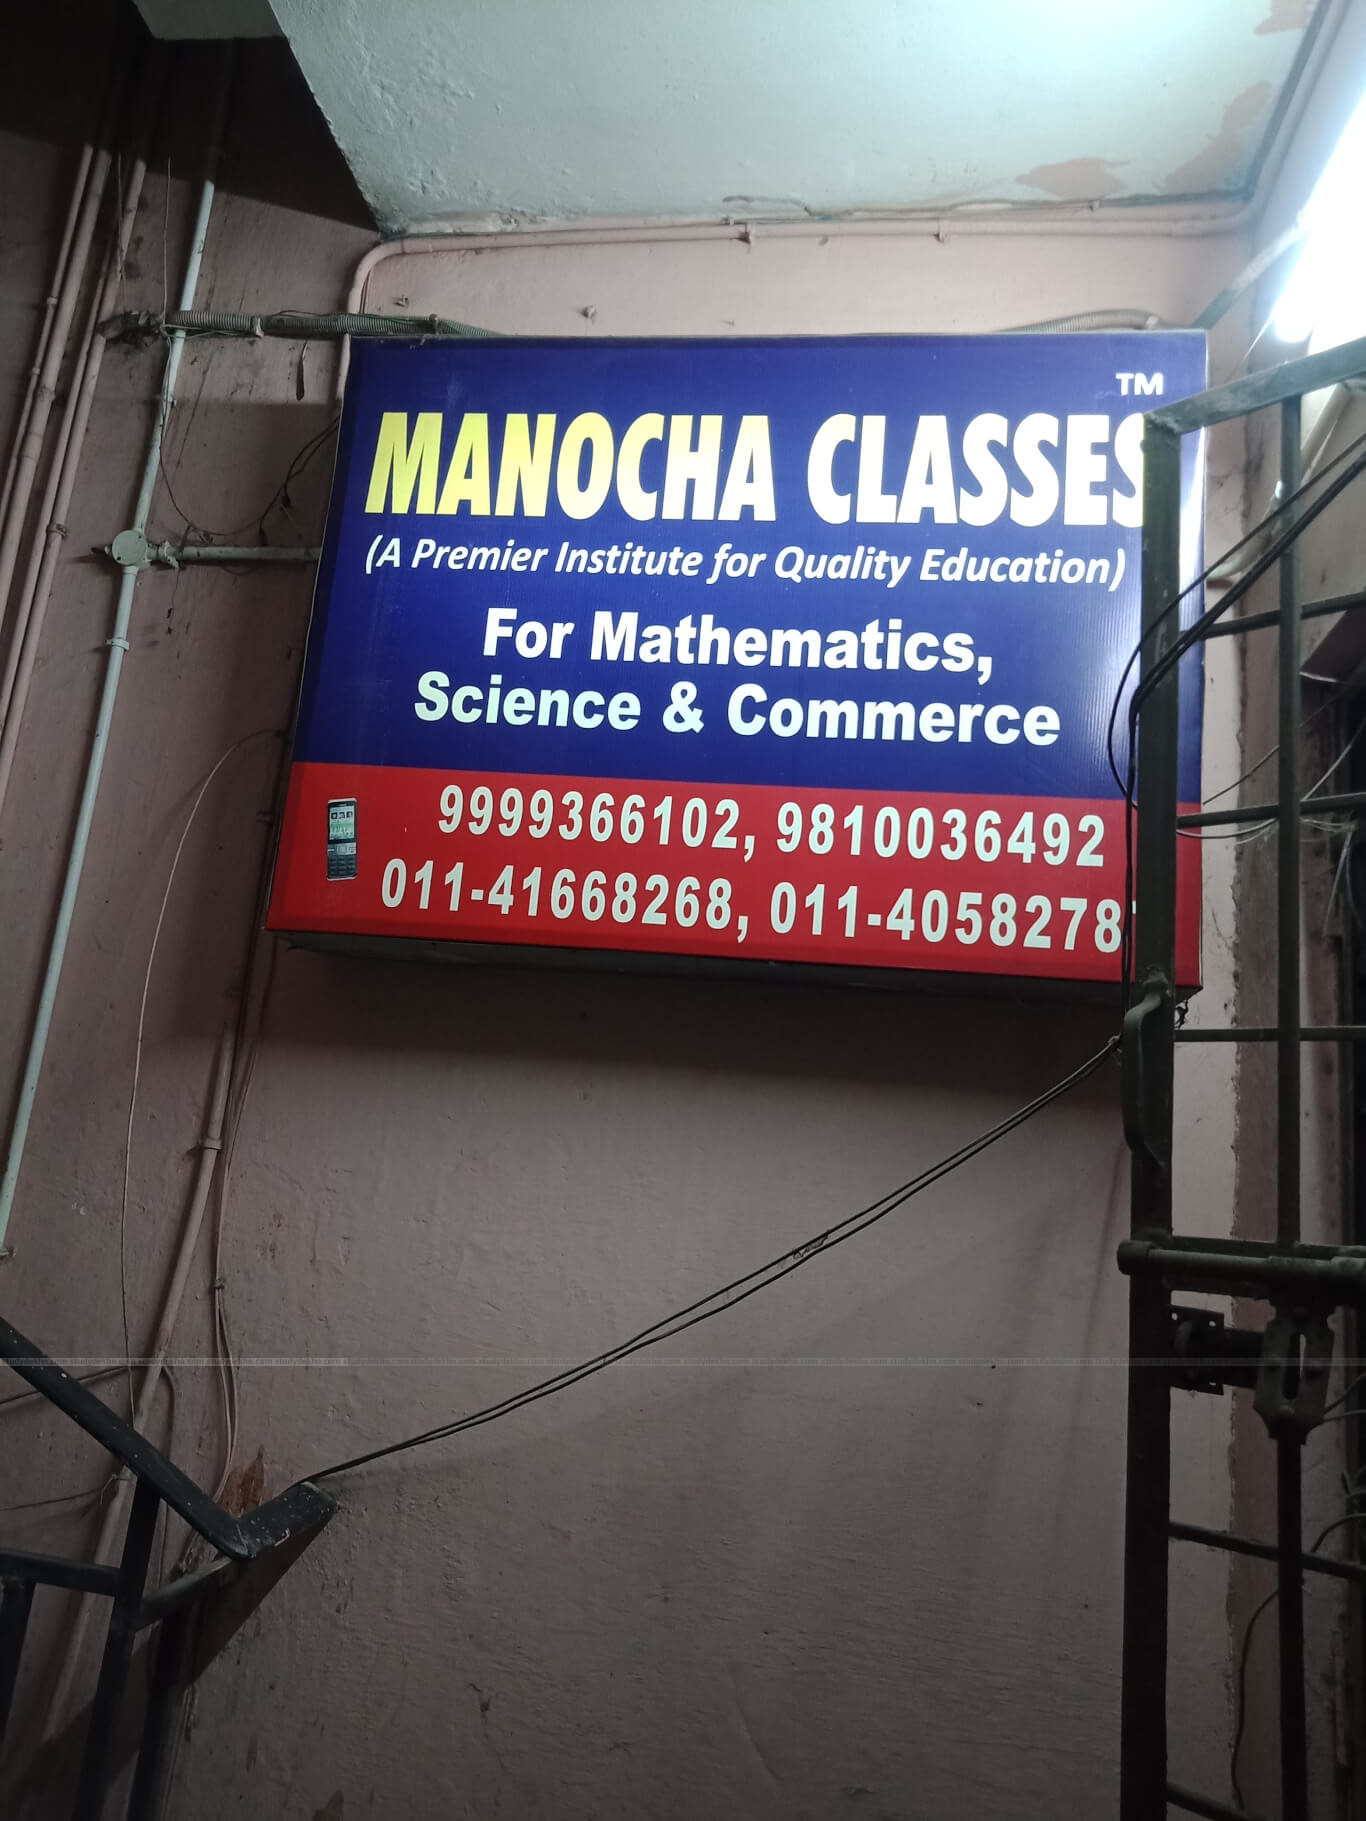 MANOCHA CLASSES Logo